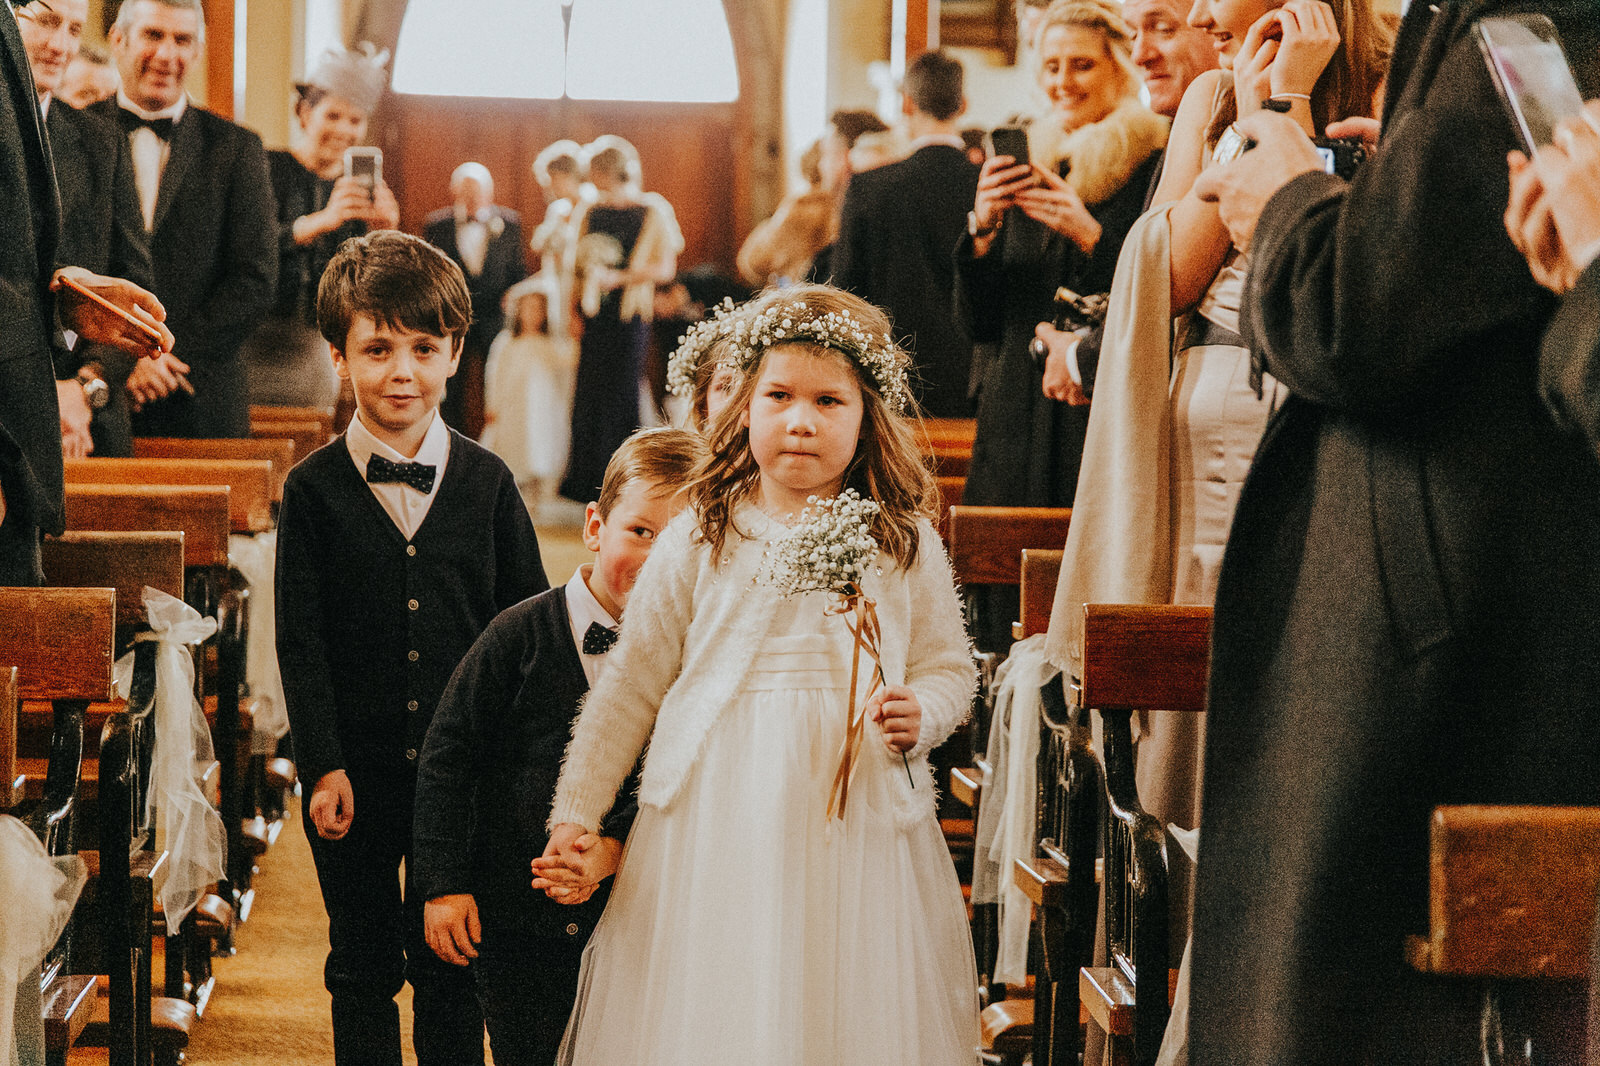 Dunbrody_House_Wedding_photographer_067.jpg